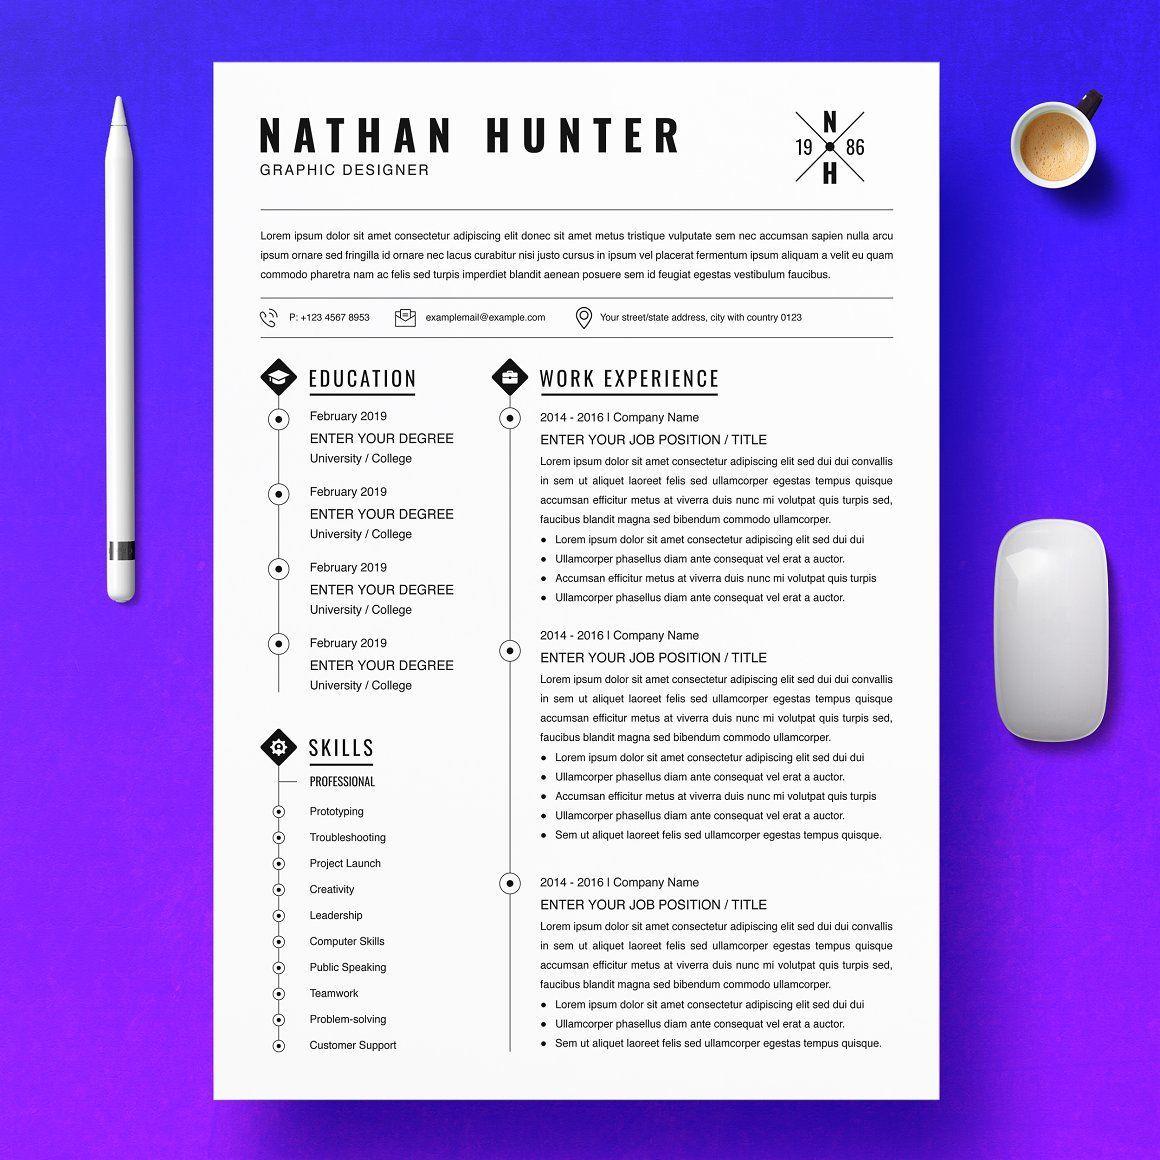 Graphic Designer Resume, InDesign CV. It is easily